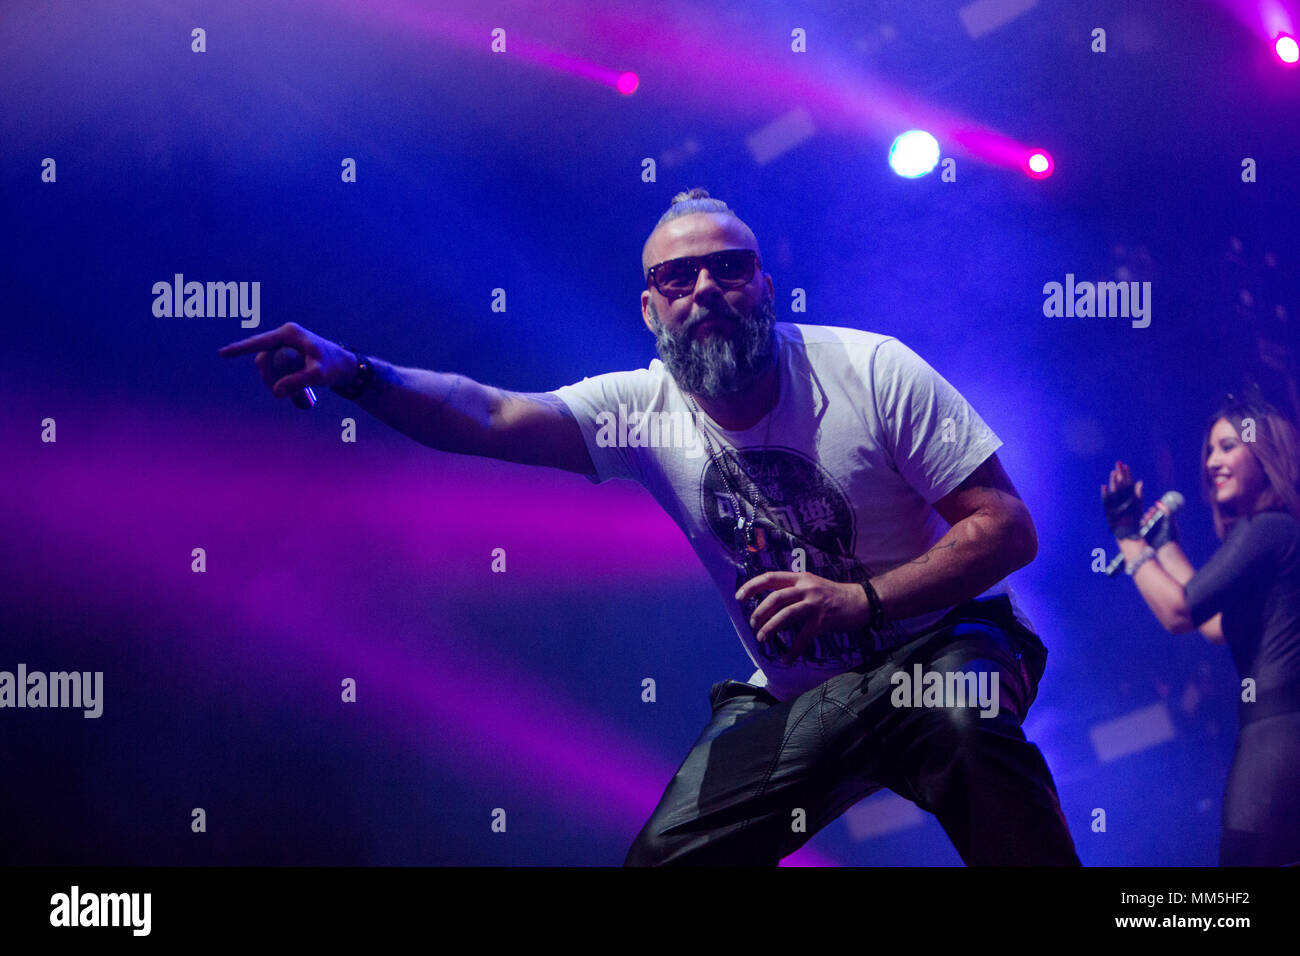 Bubblegum Dance Music Stock Photos & Bubblegum Dance Music